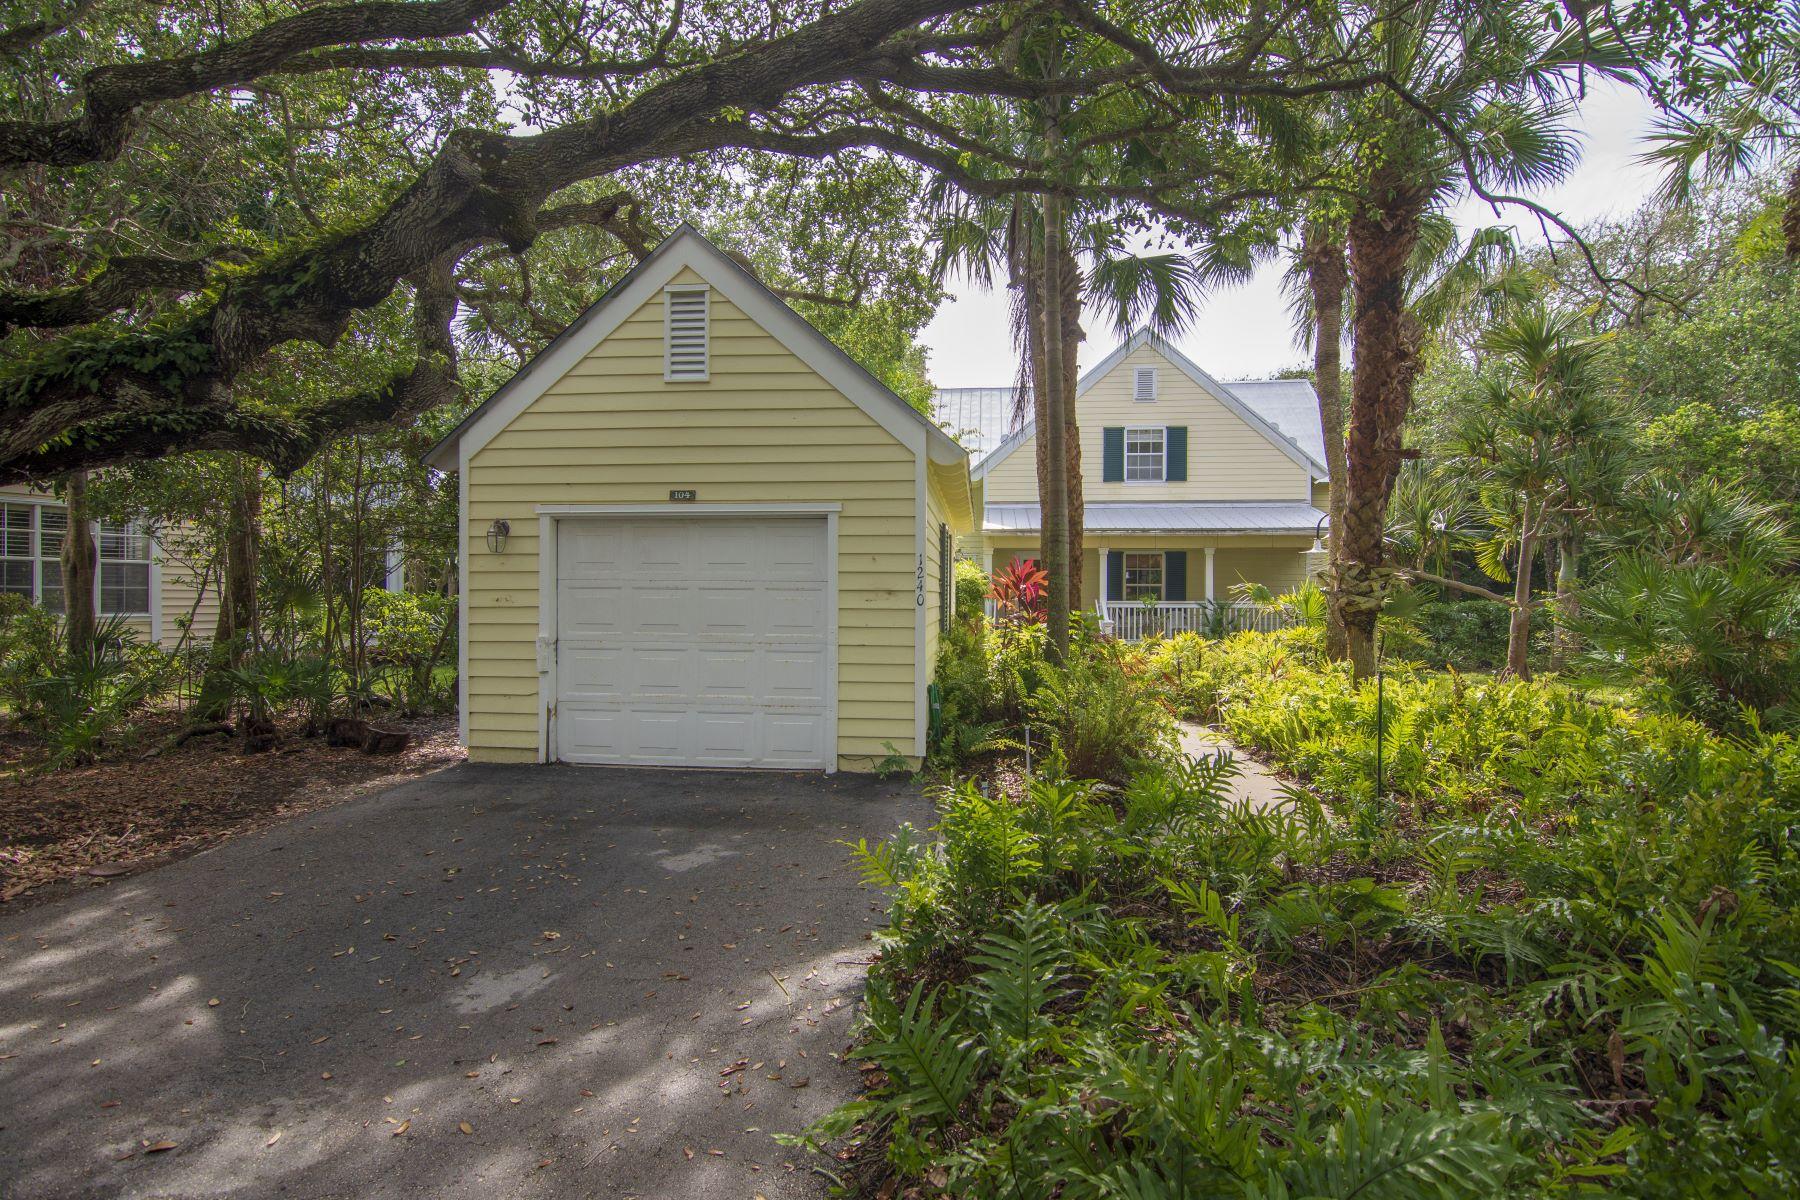 townhouses для того Продажа на 1240 Palmetto Court, #104, Vero Beach, FL 1240 Palmetto Court 104 Vero Beach, Флорида 32963 Соединенные Штаты